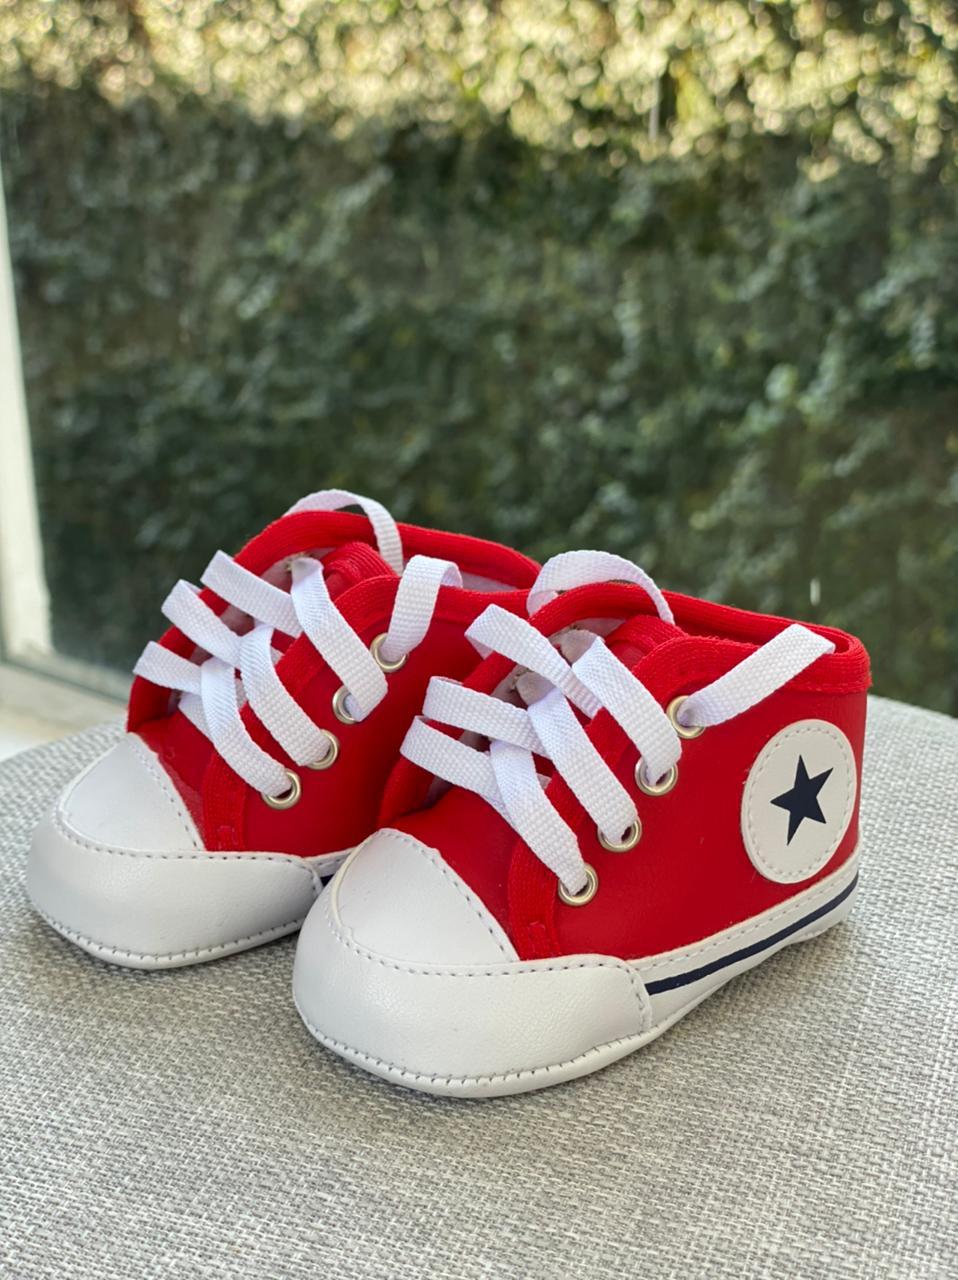 Tennis All Star - Vermelho